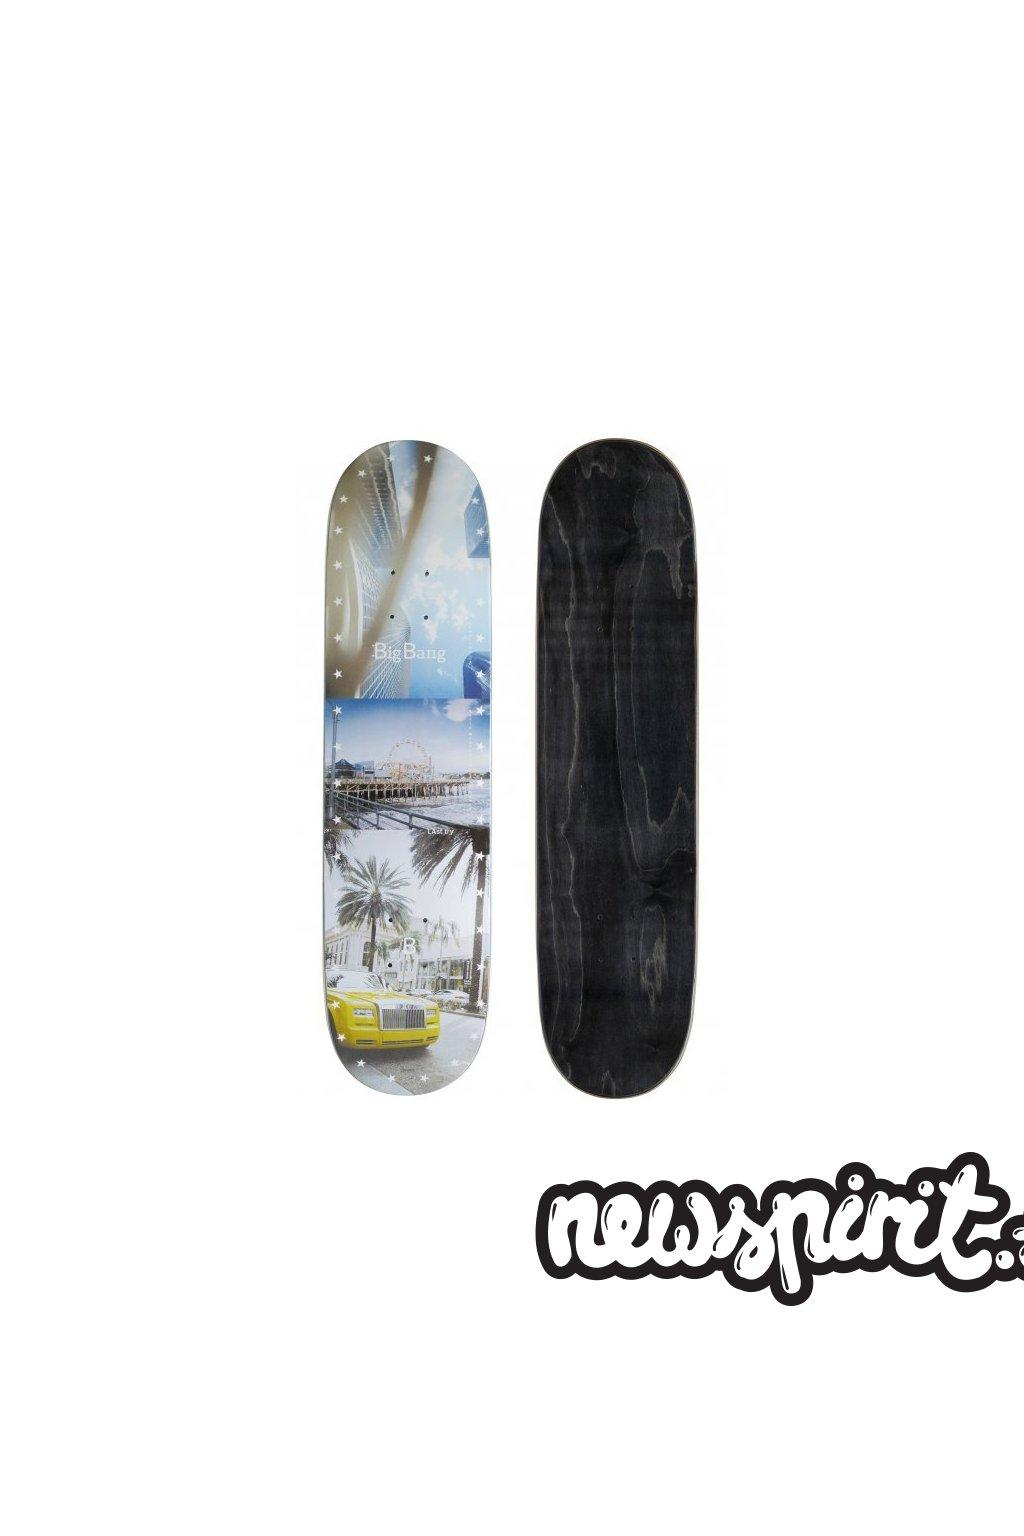 skateboard bigbang last try deep concave 1